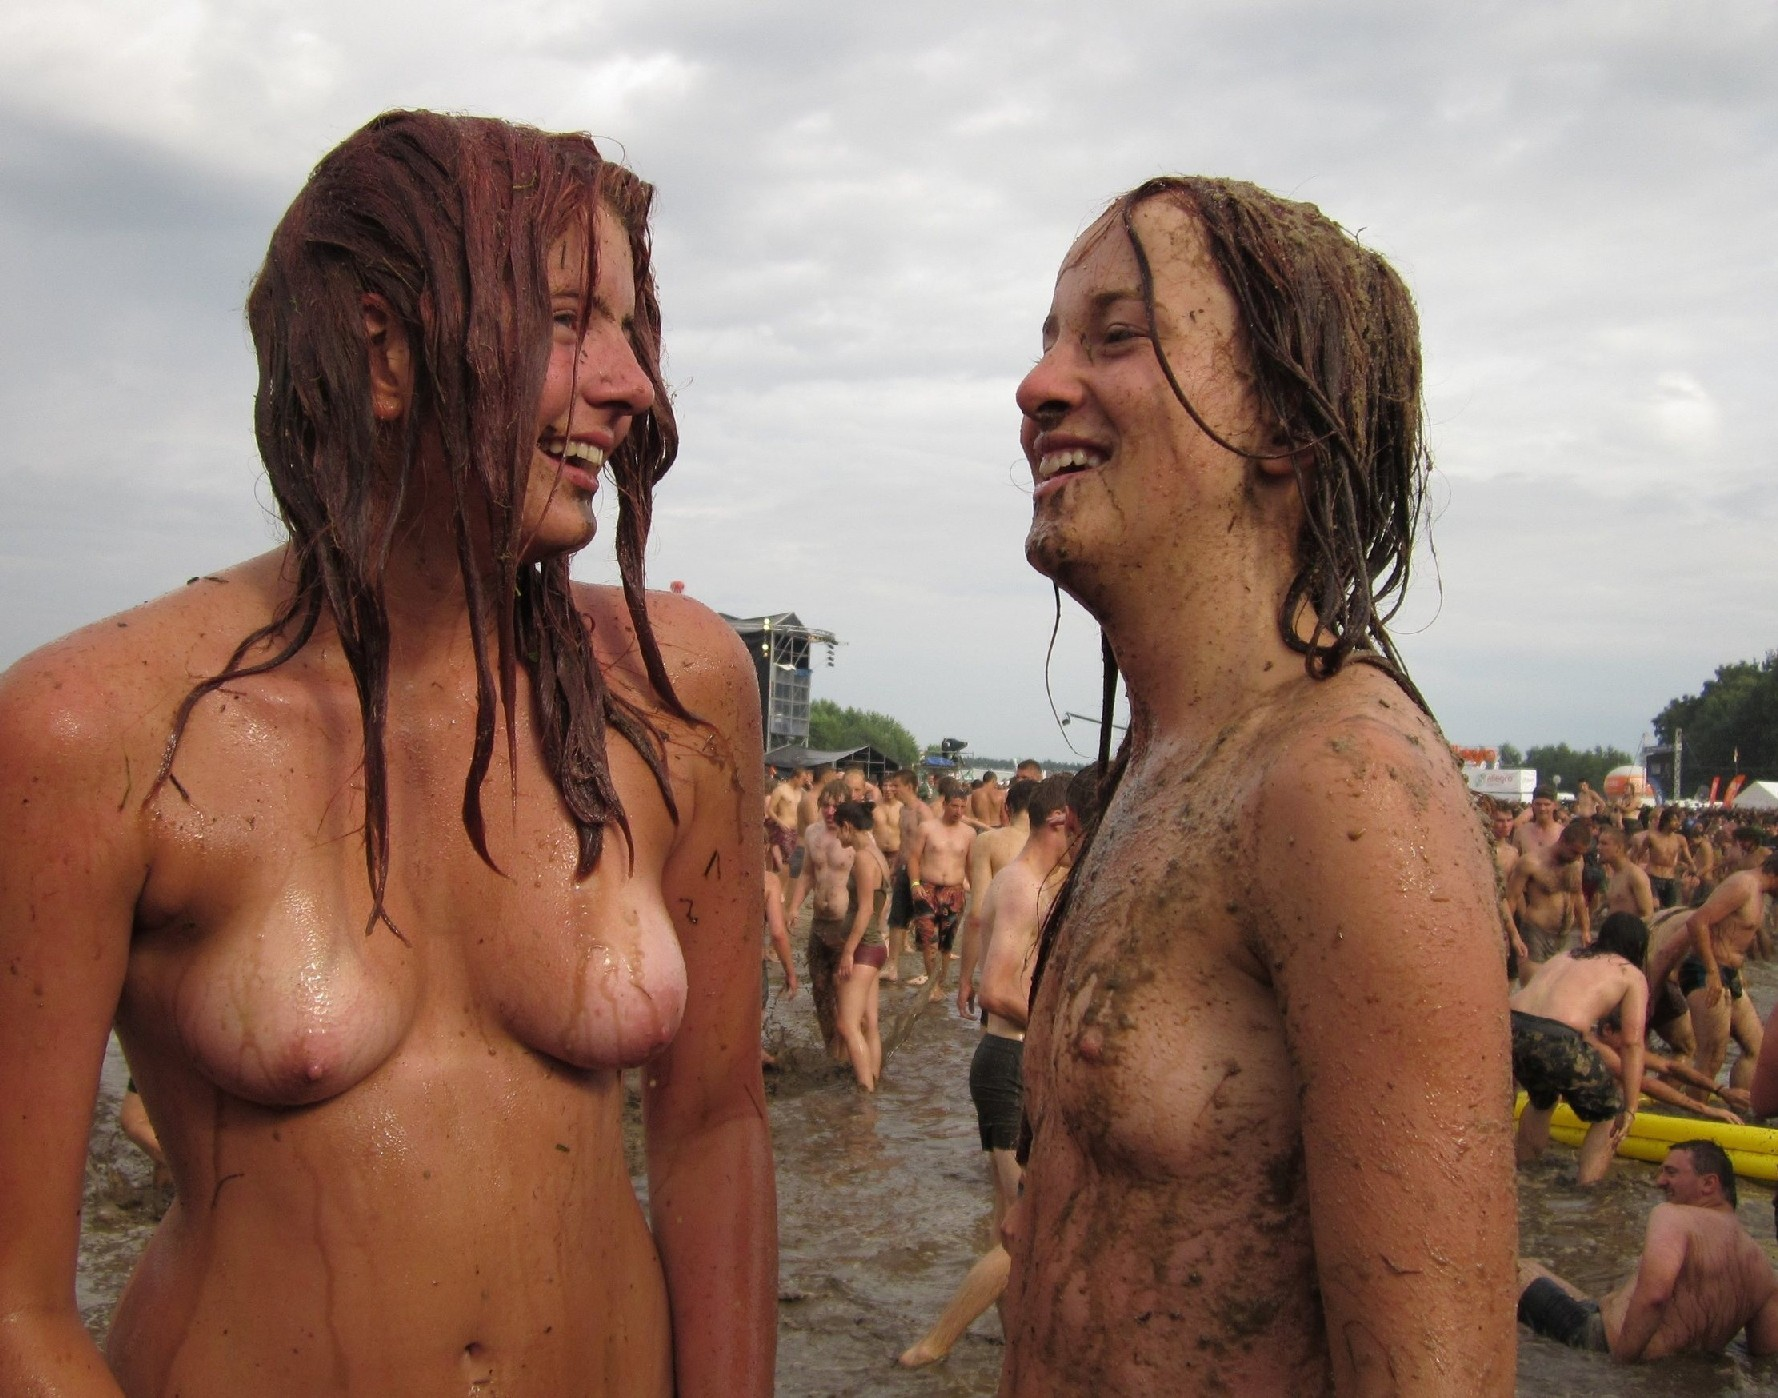 festival-nudistok